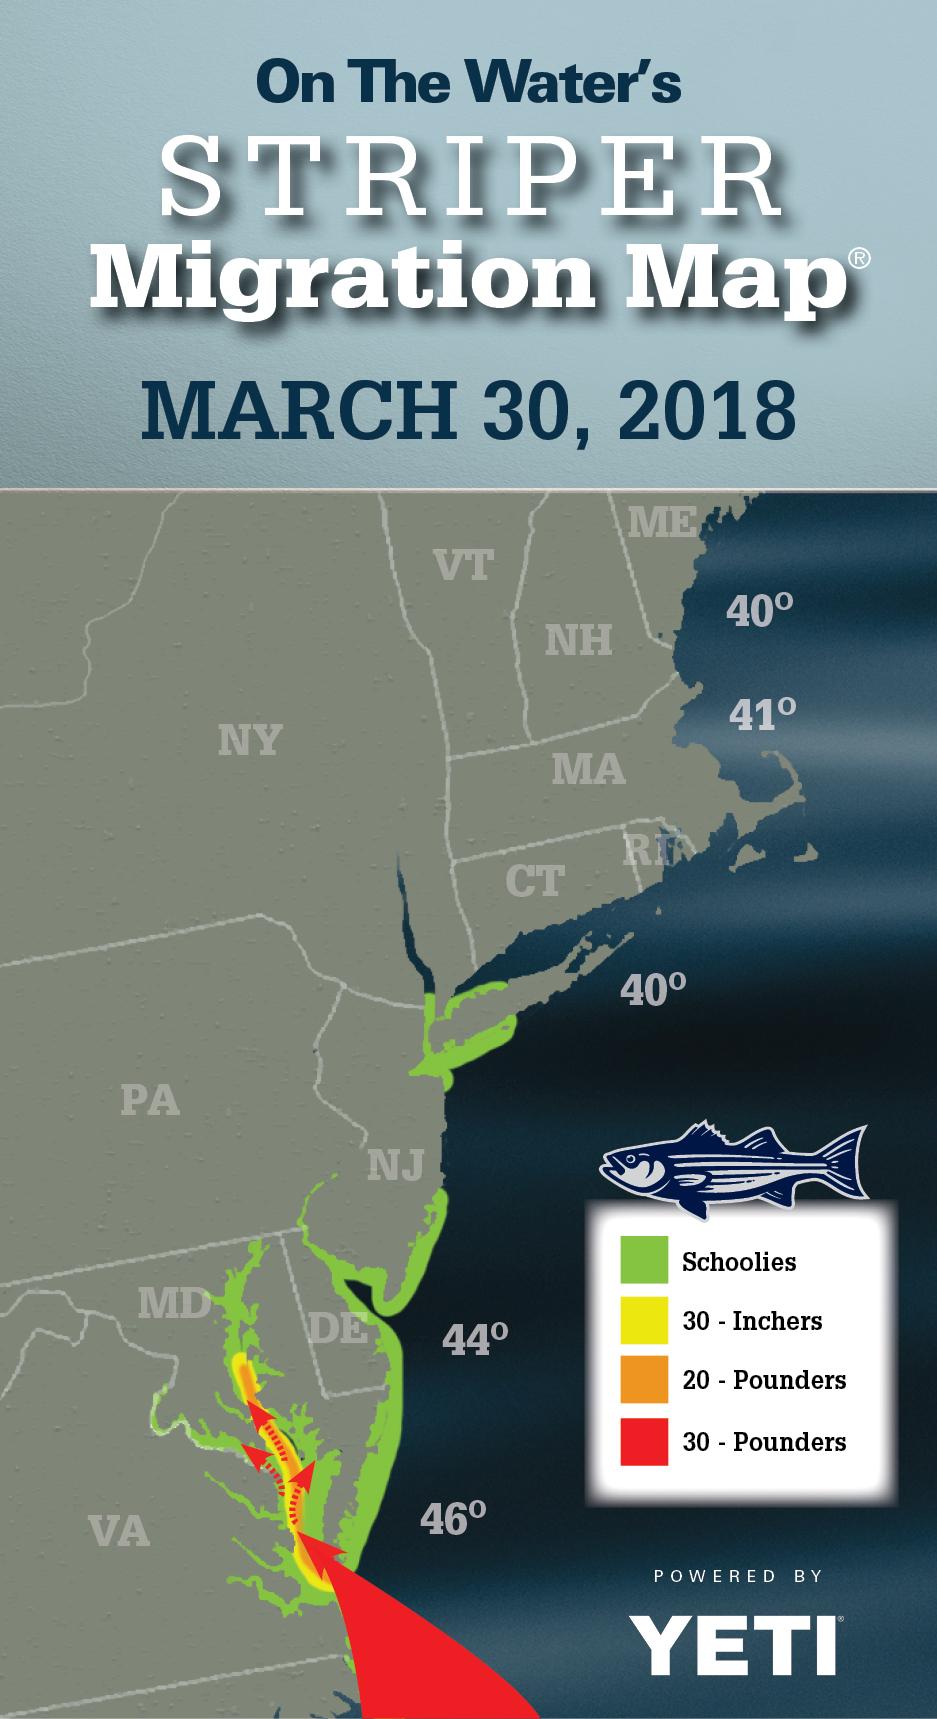 Striper Migration Map March 30 2018